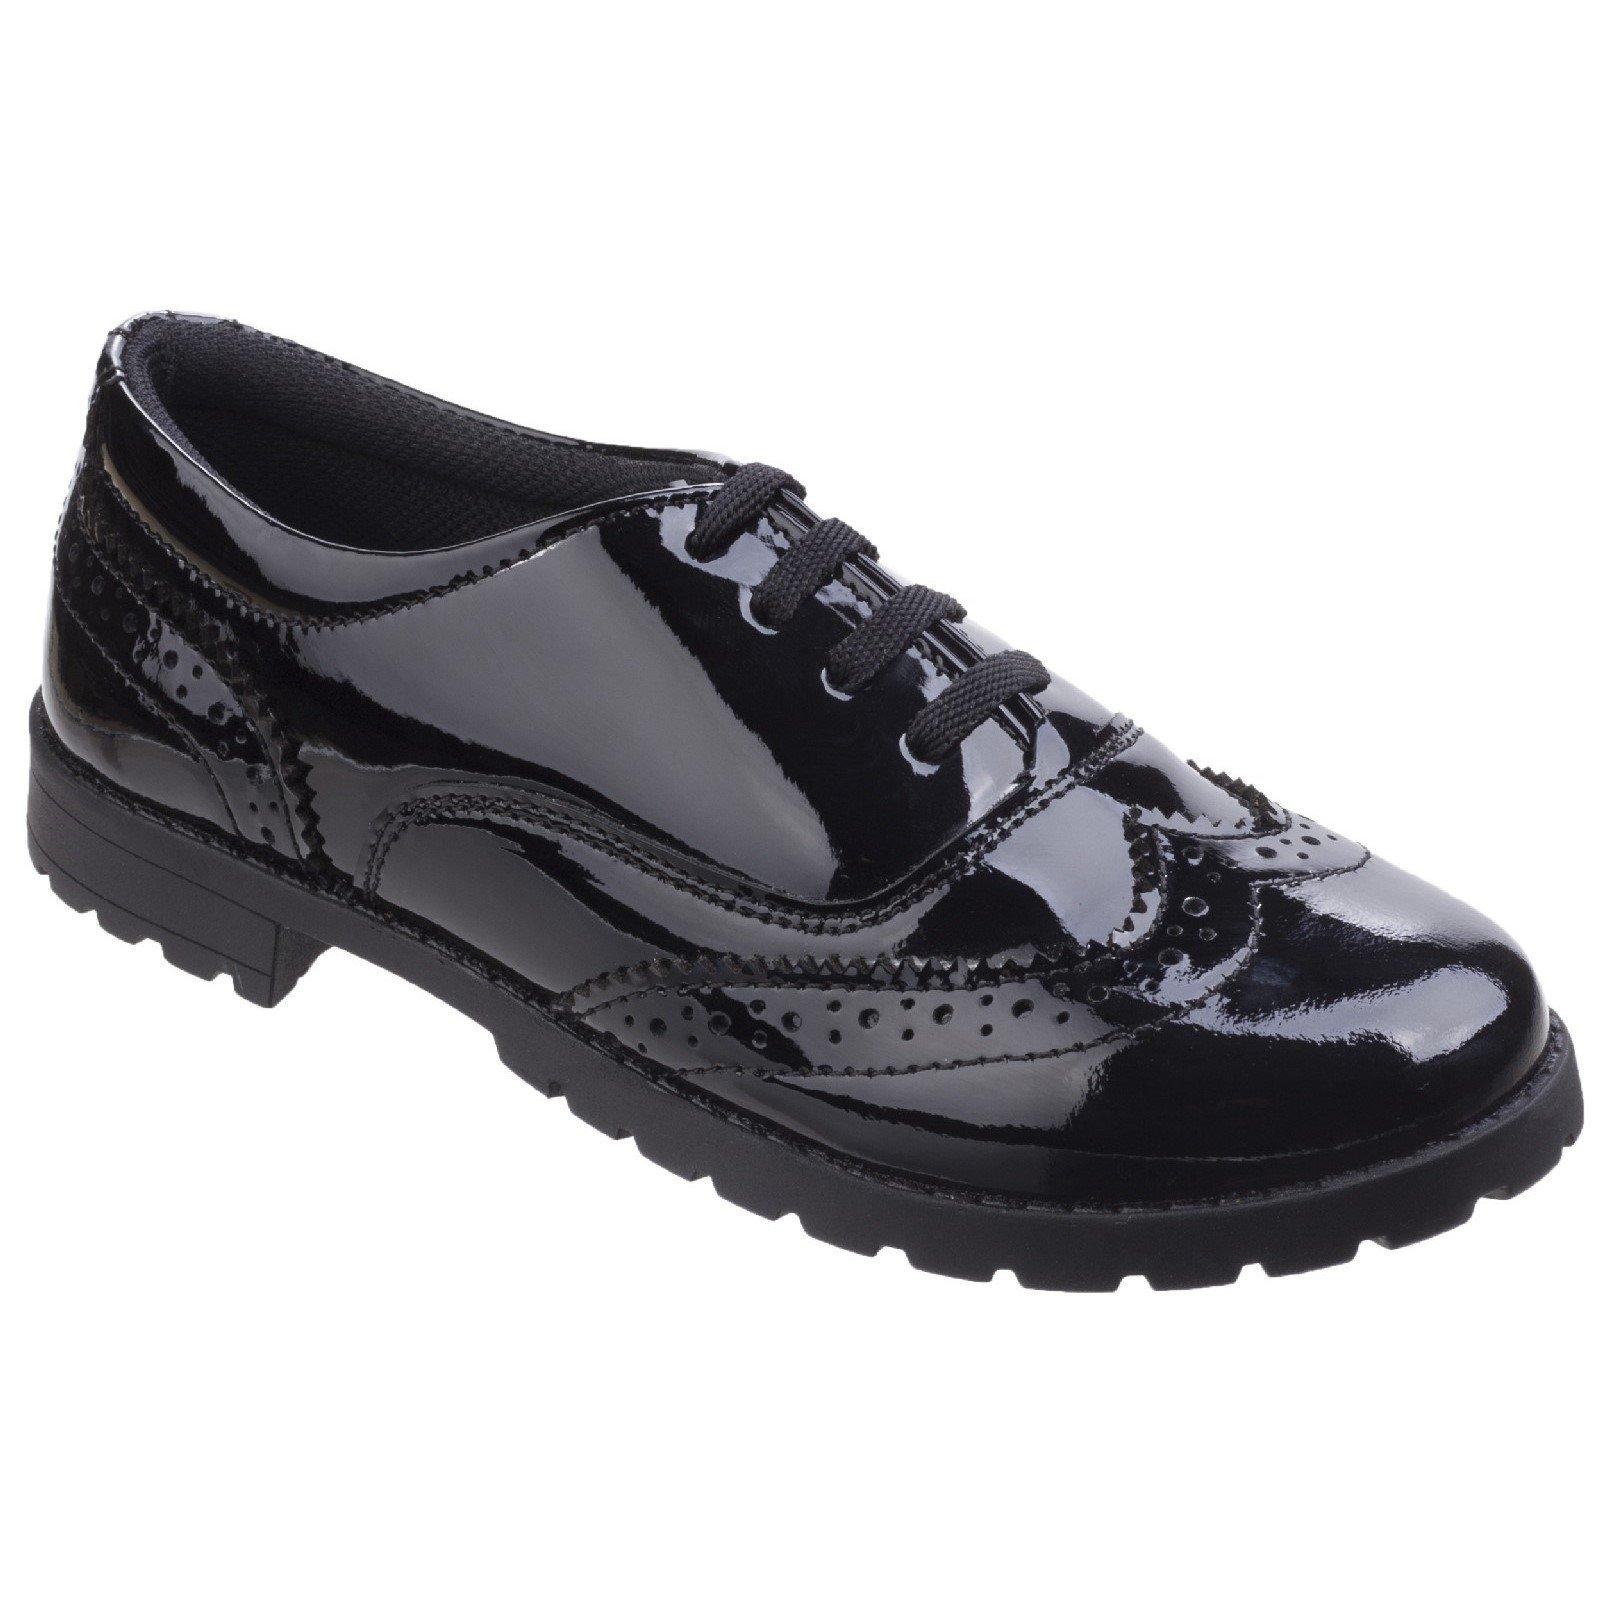 Hush Puppies Kid's Eadie Senior Patent School Shoe Black 32735 - Patent Black 7